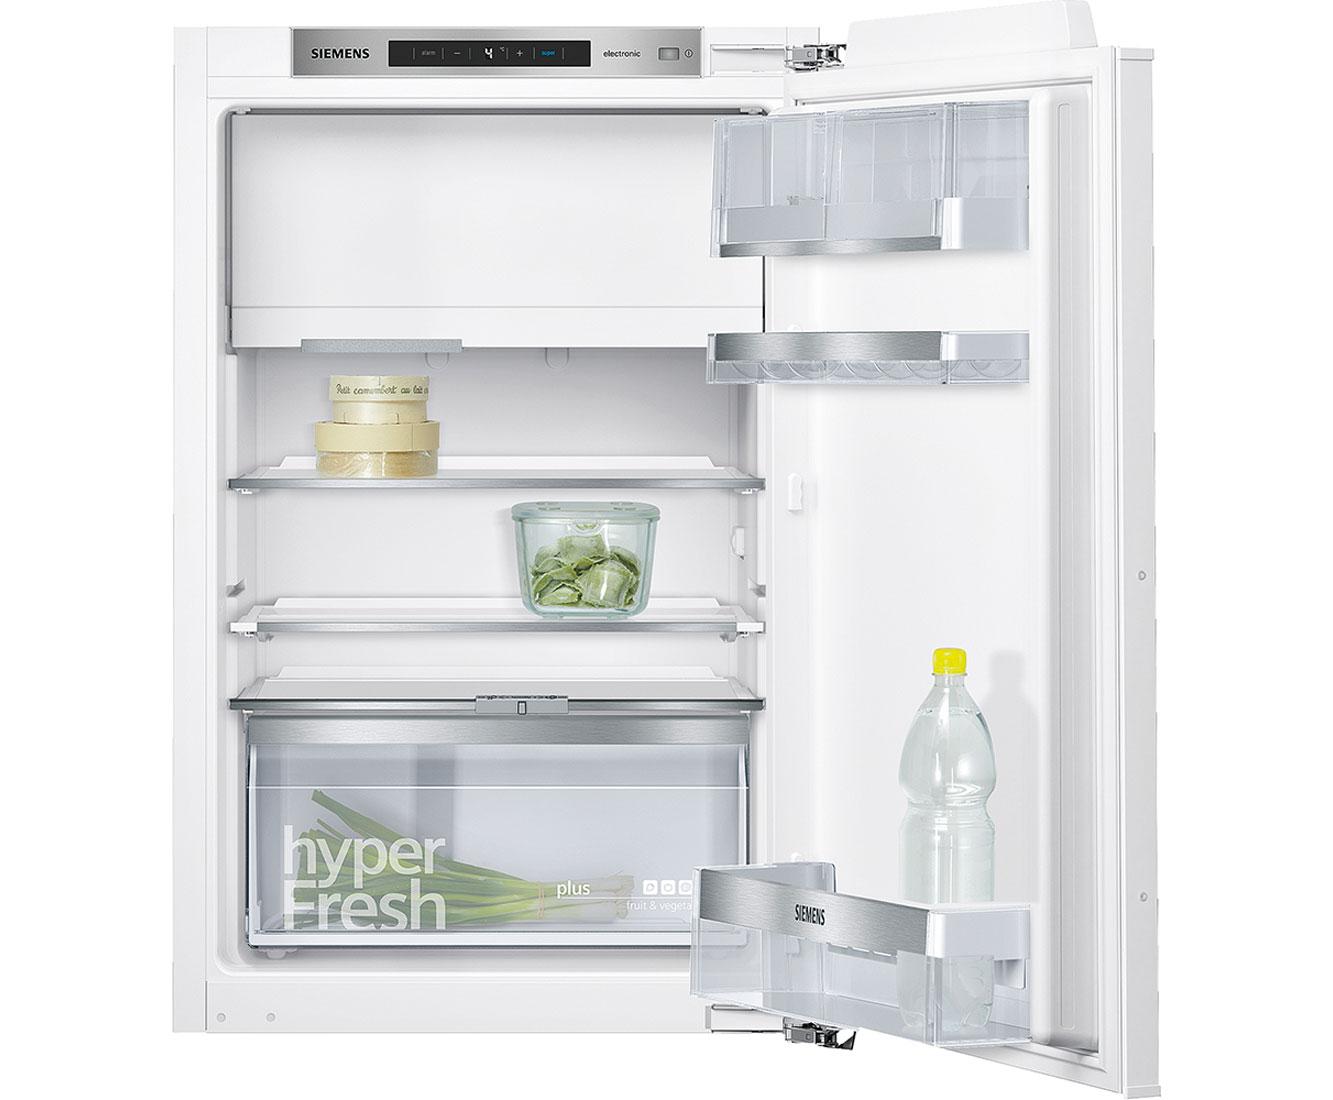 Siemens Kühlschrank : Siemens ki lad kühlschrank eingebaut cm weiß neu ebay